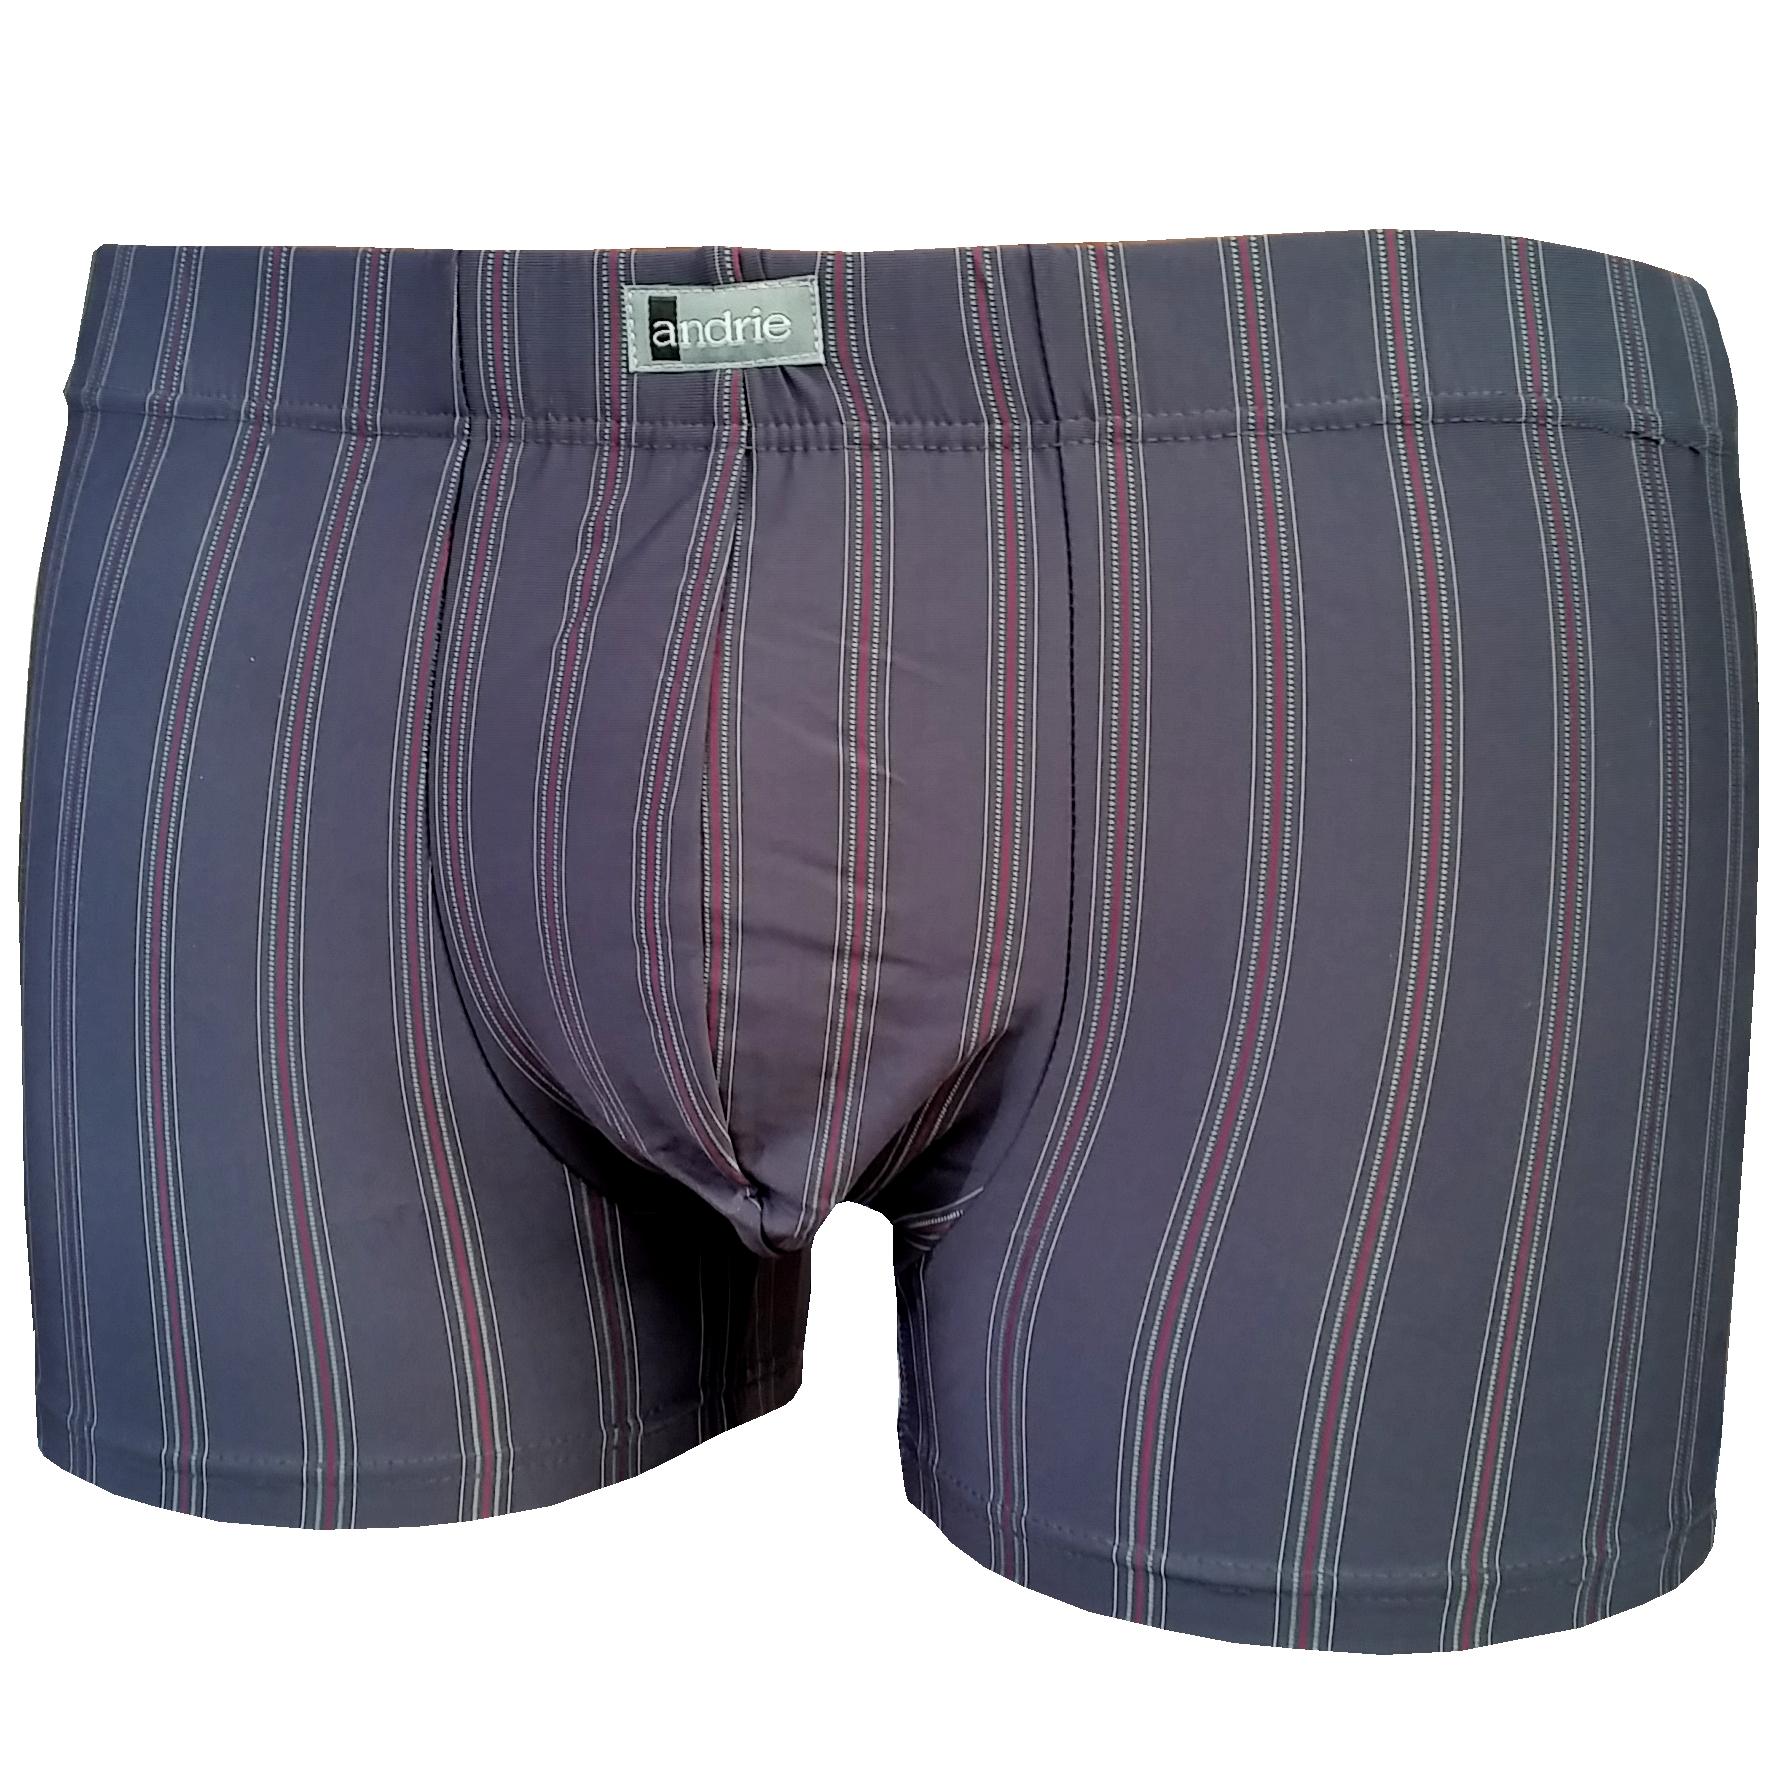 Andrie PS 4442 pánské boxerky, šedá tmavá, L